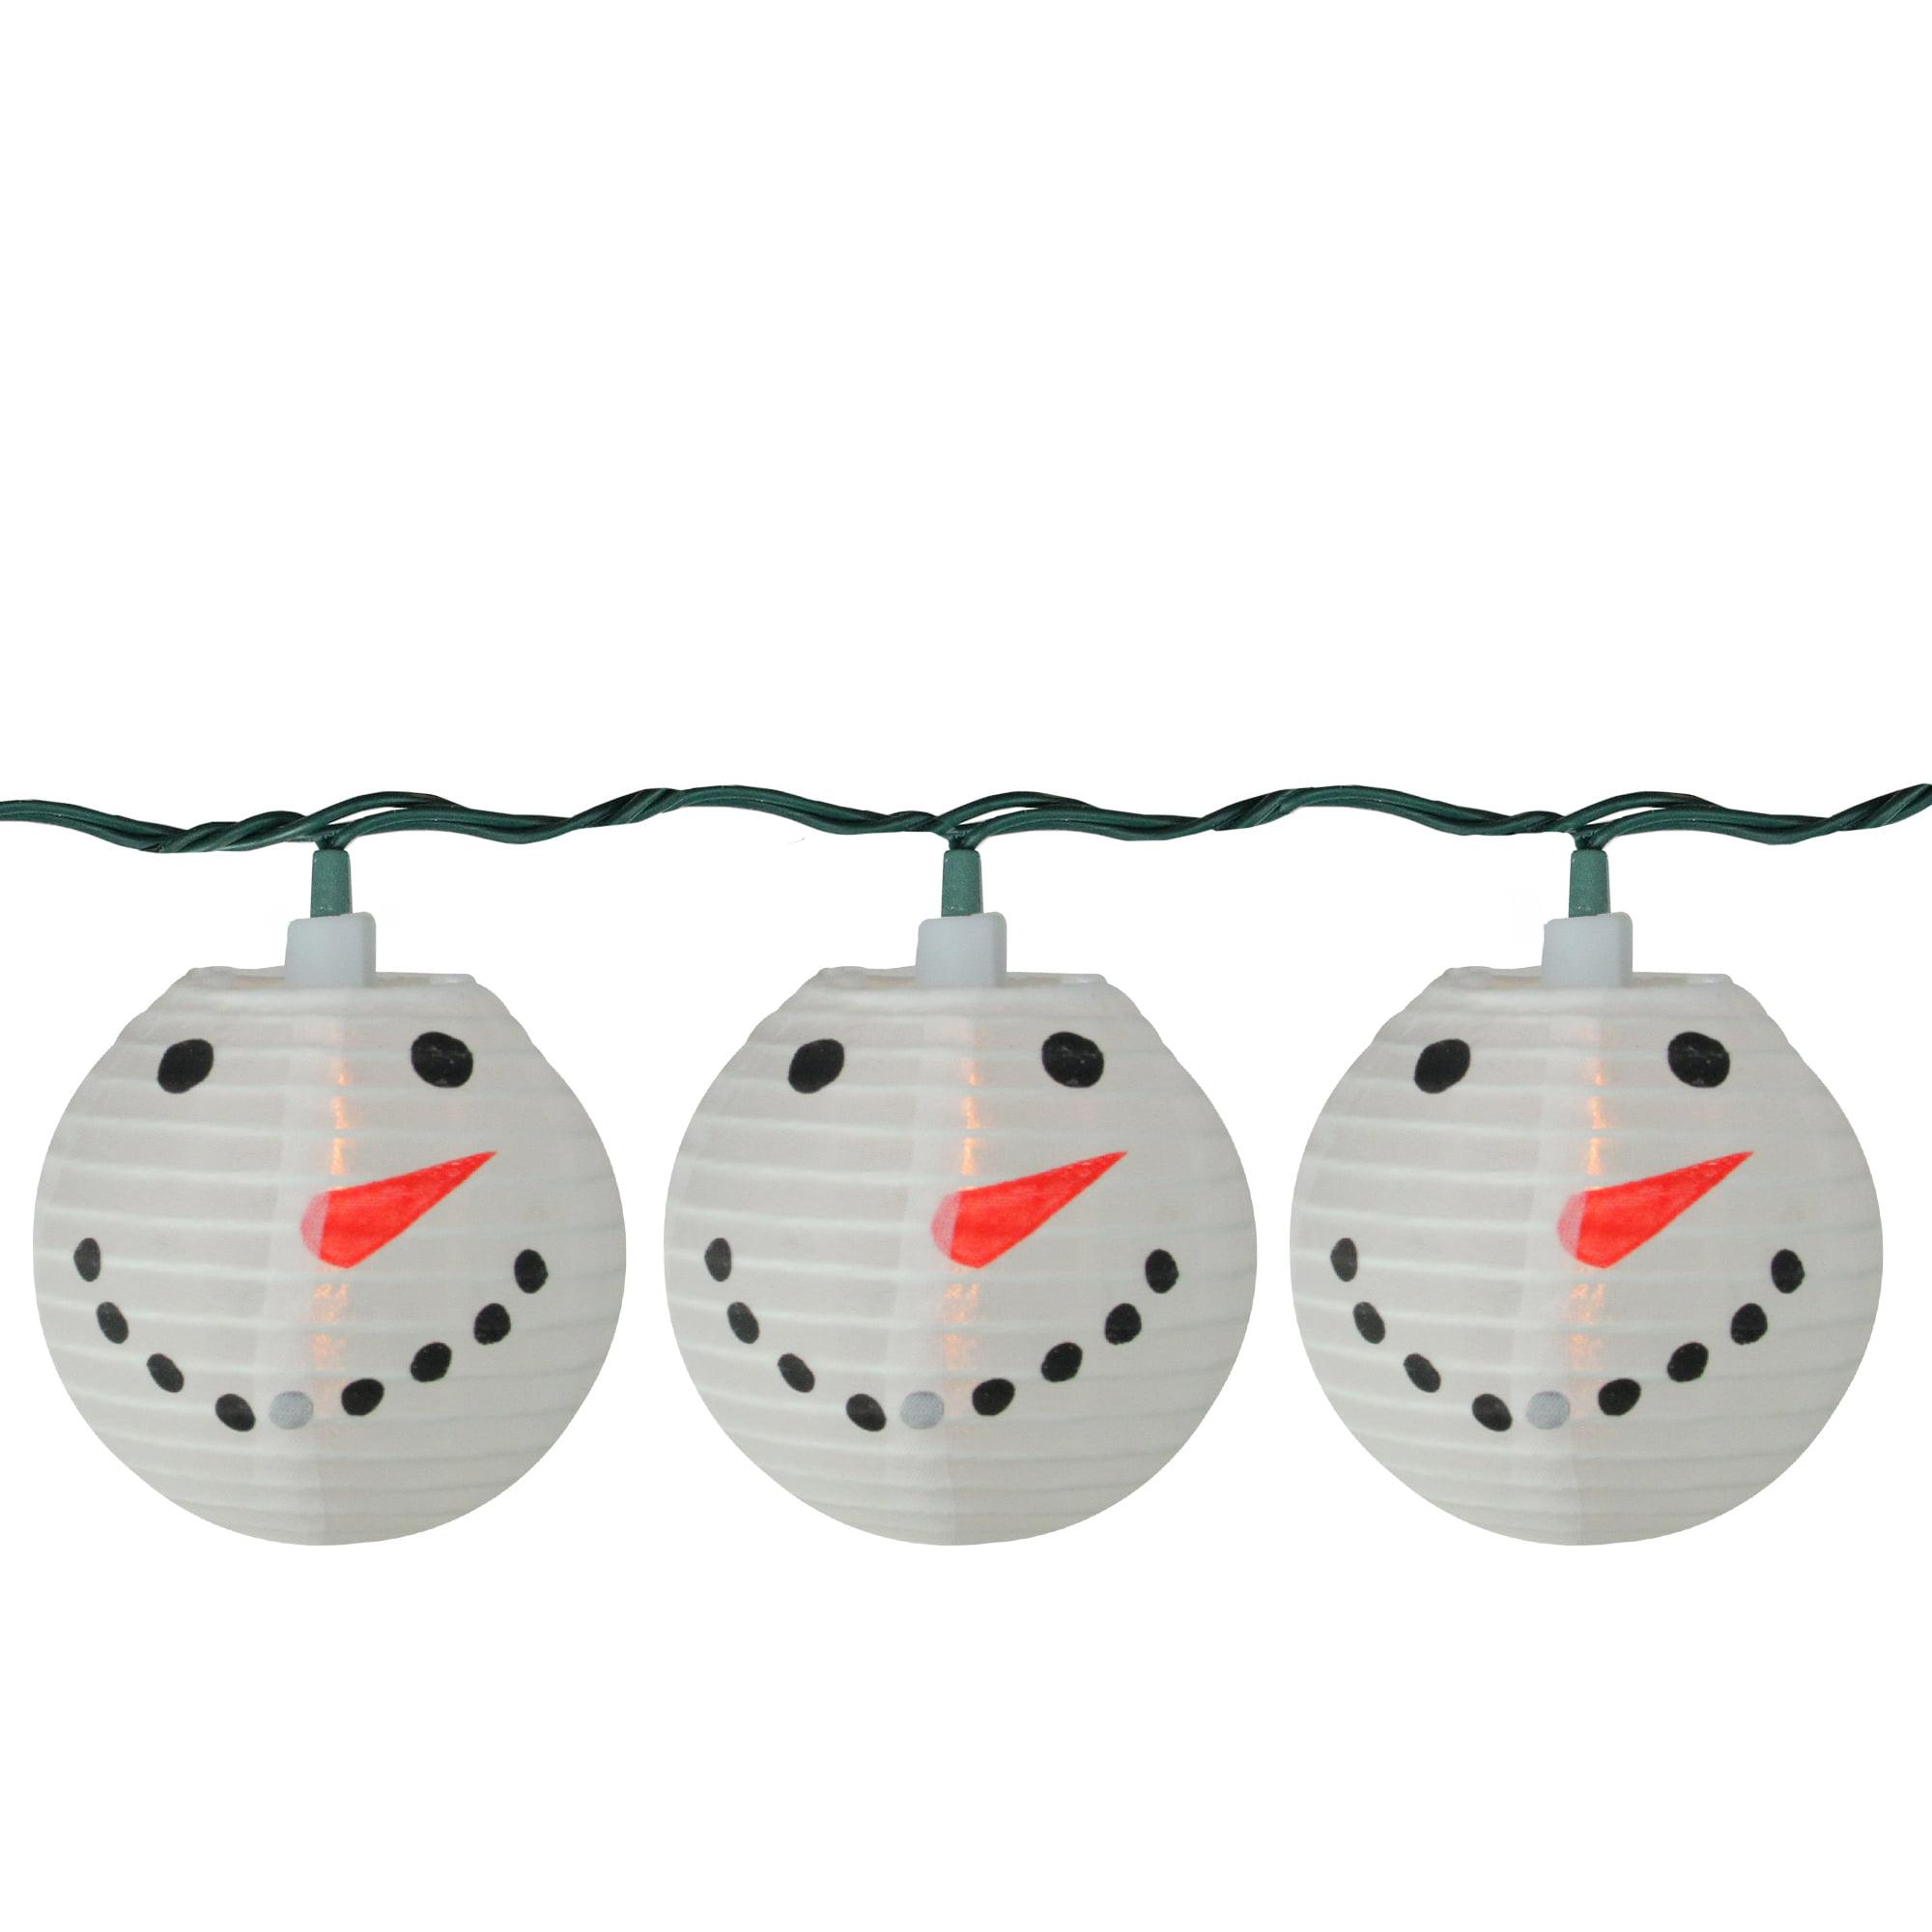 Set of 10 Snowman Lantern Christmas Novelty Christmas Lights - 10 ft White Wire